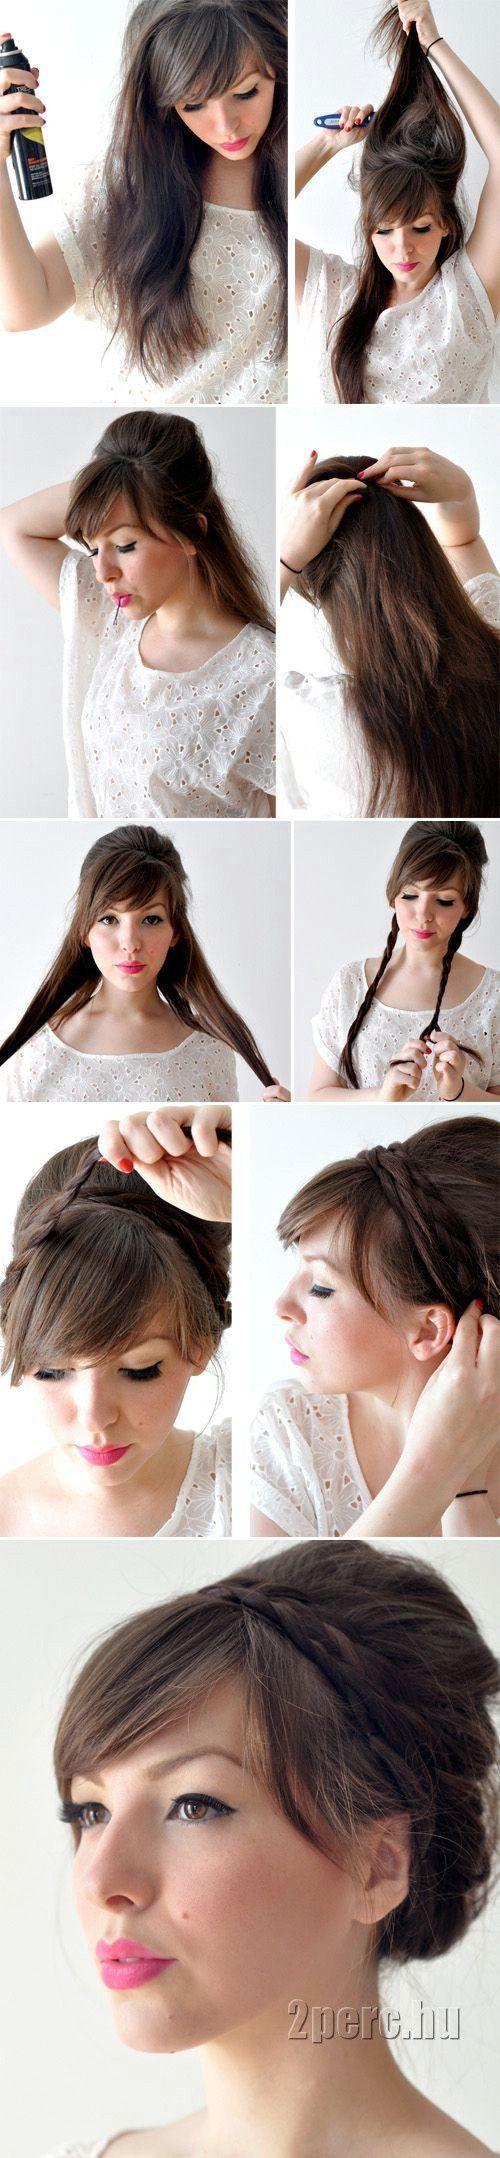 Braid bun cabello pinterest hair style hair makeup and makeup